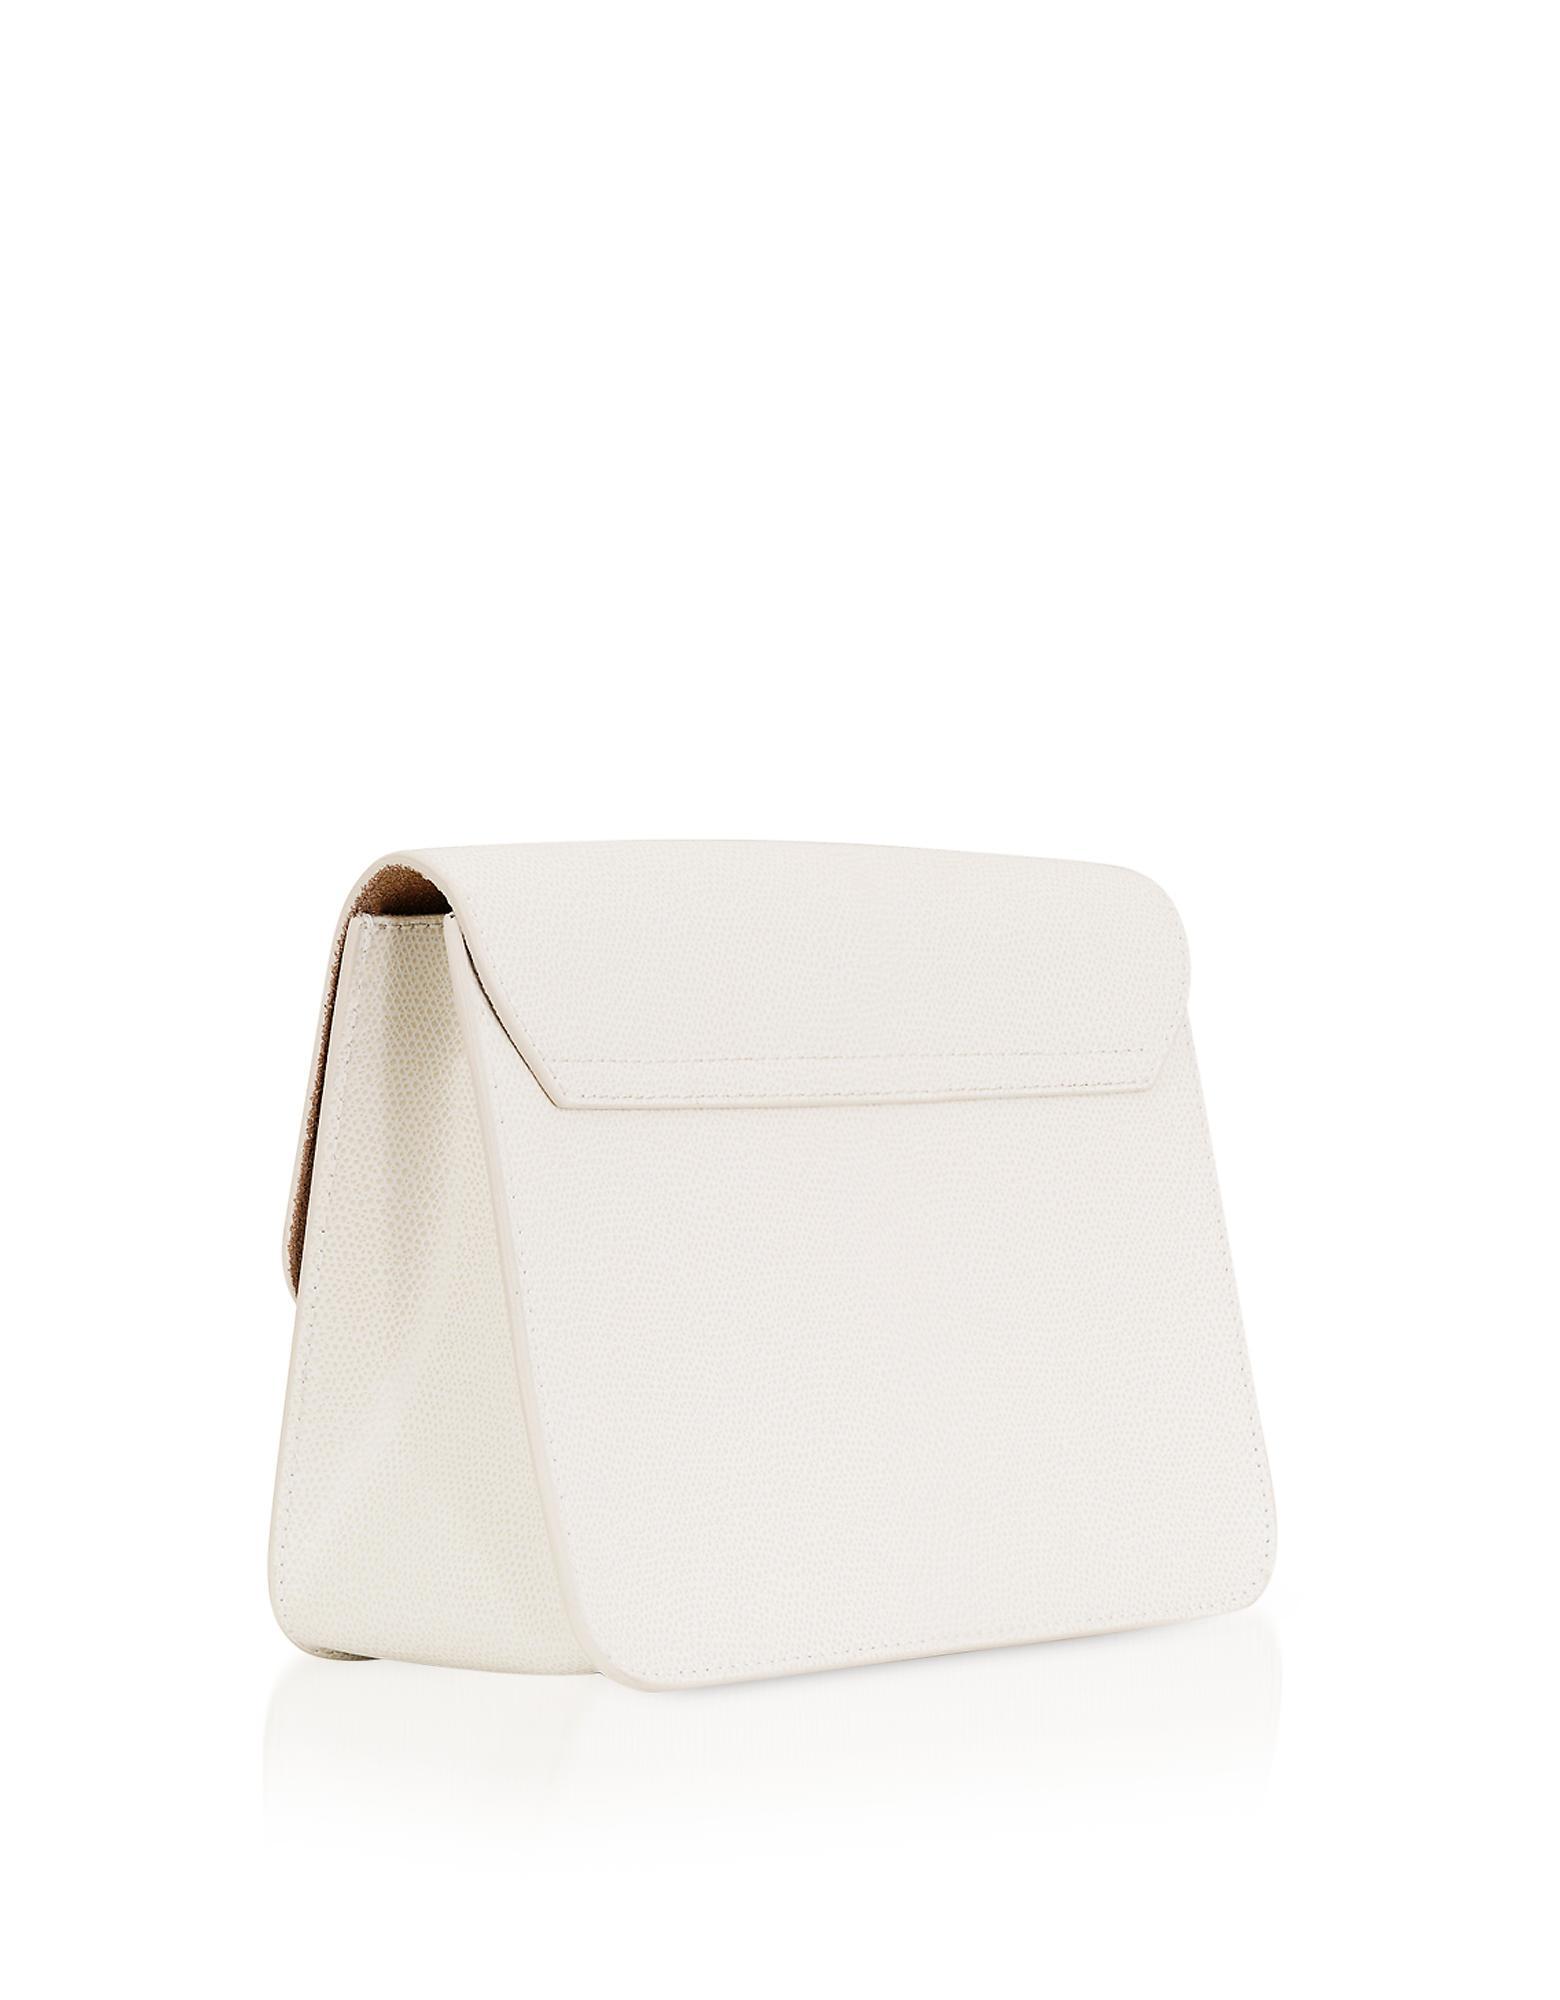 2b200c3910 Lyst - Furla Petalo Leather Metropolis Small Crossbody in White